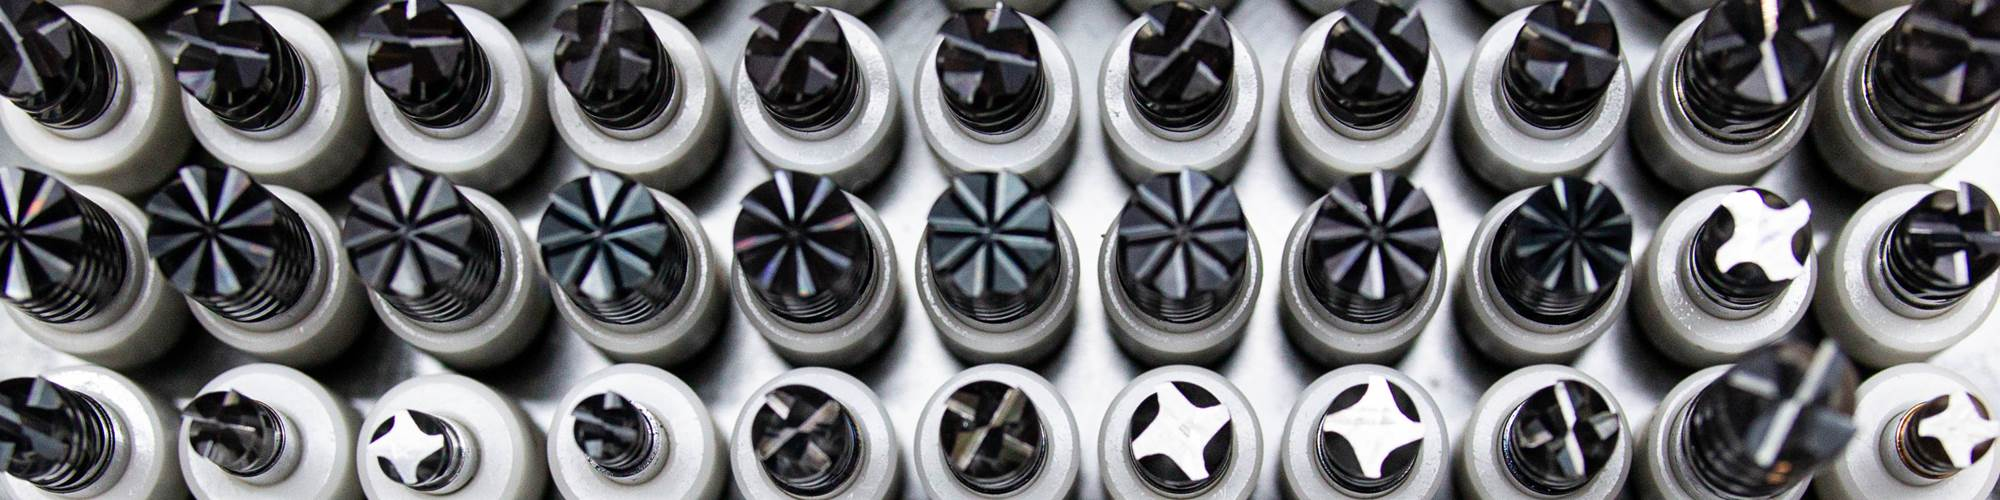 Regrinding Milling Tools